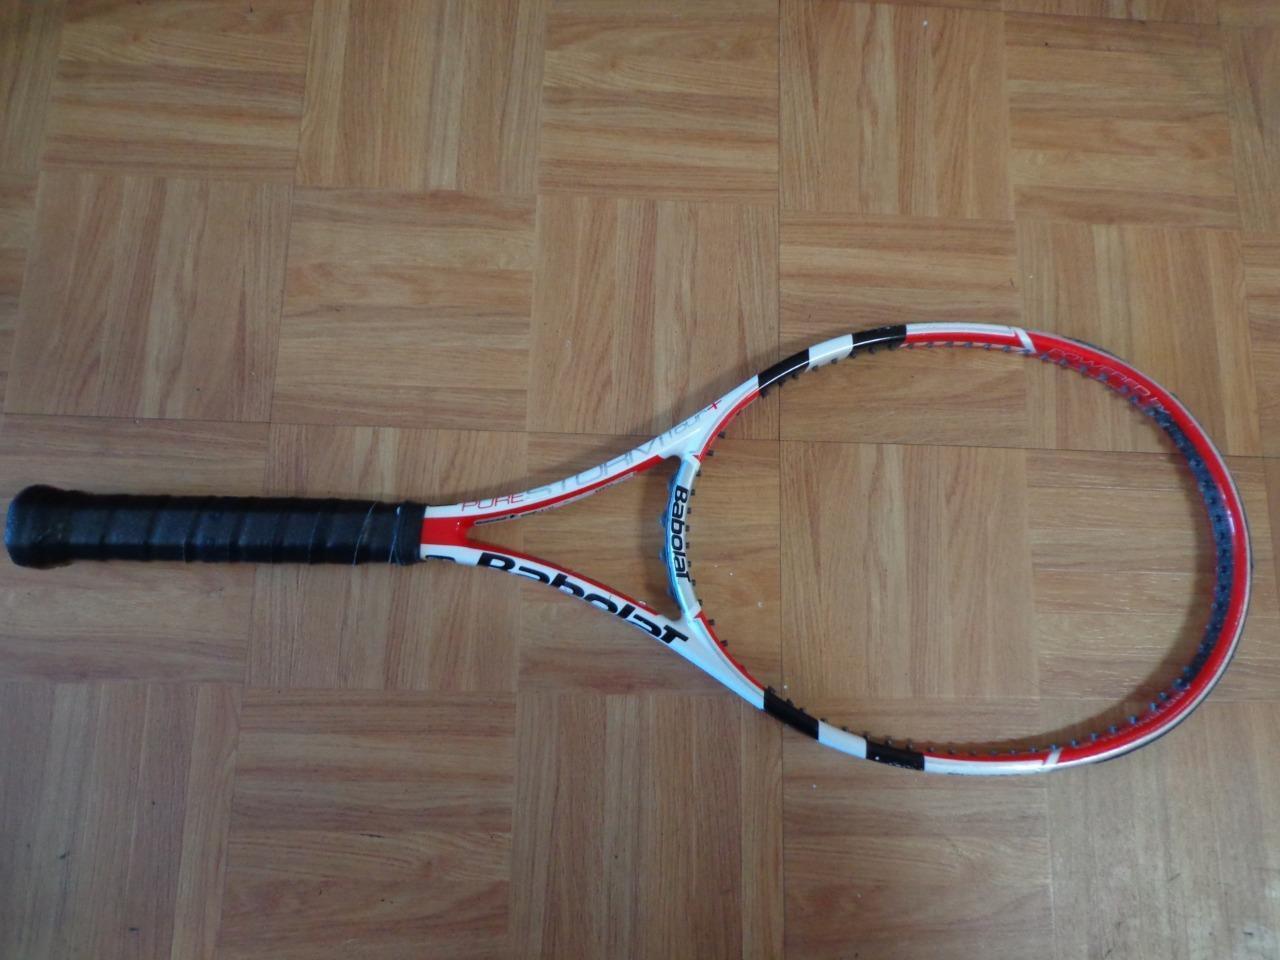 Babolat Pure Storm Gt 10.4 OZ (environ 294.83 g) 98 Head 4 1 4 grip raquette de tennis